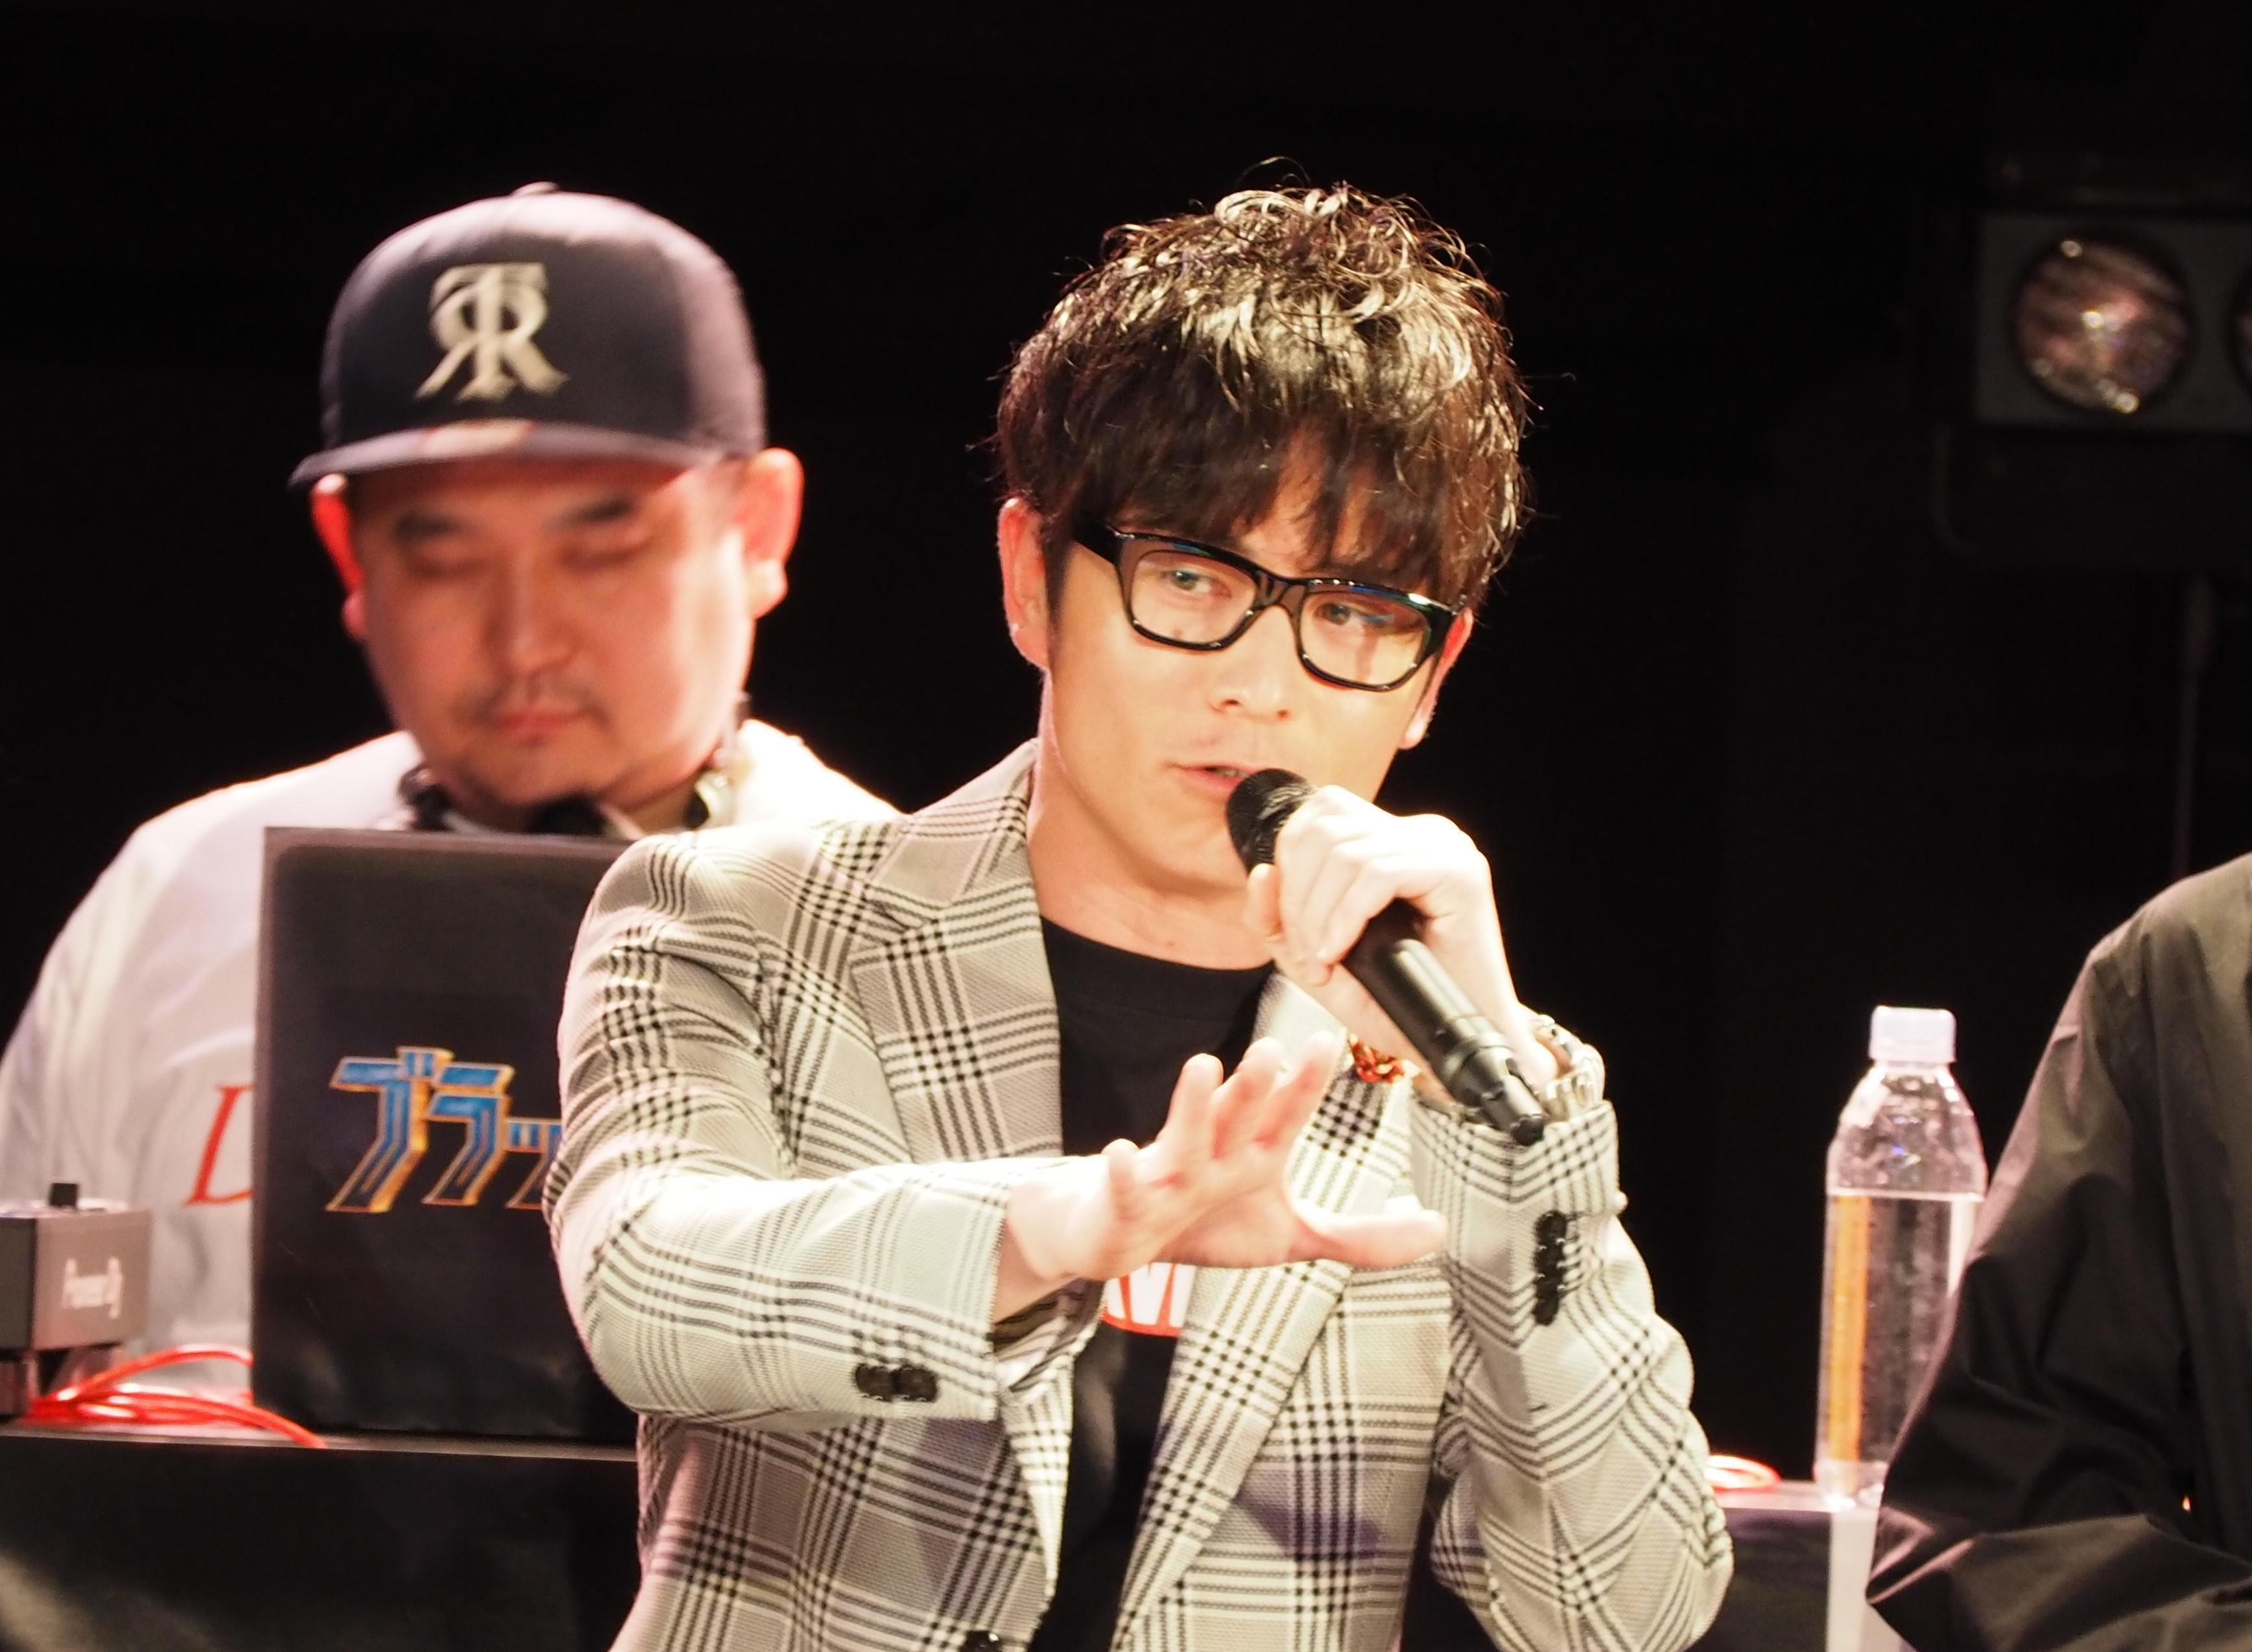 http://news.yoshimoto.co.jp/20180227220617-00072ff087a66e837aafb6382b7a80347f38920f.jpg